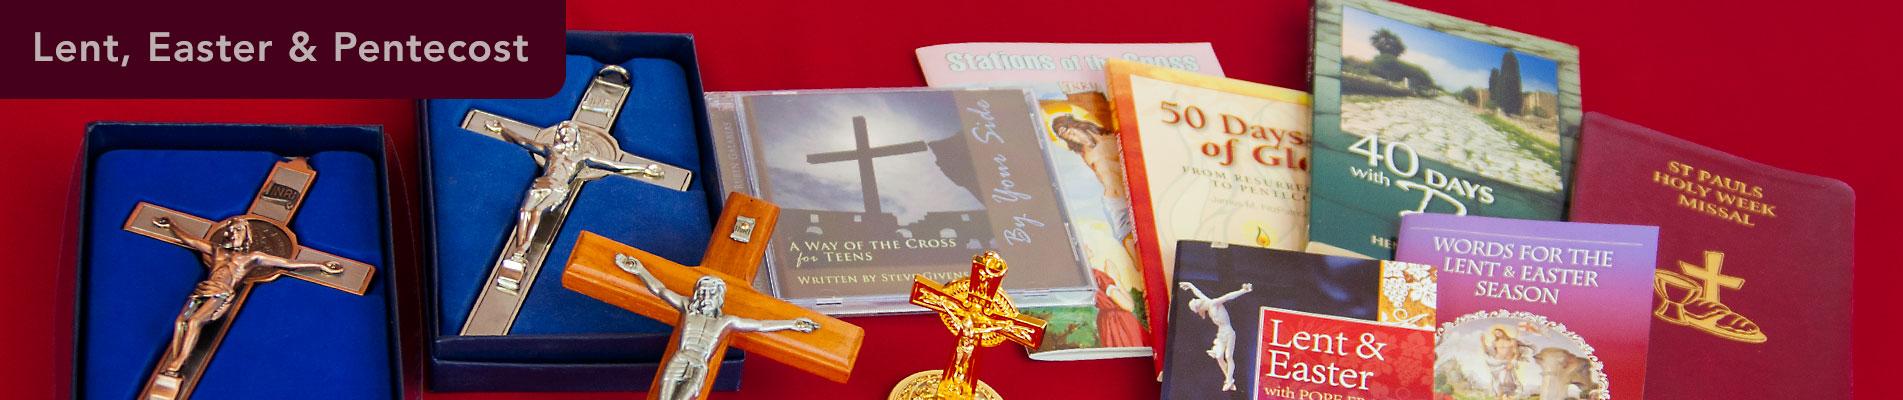 Lent, Easter & Pentecost